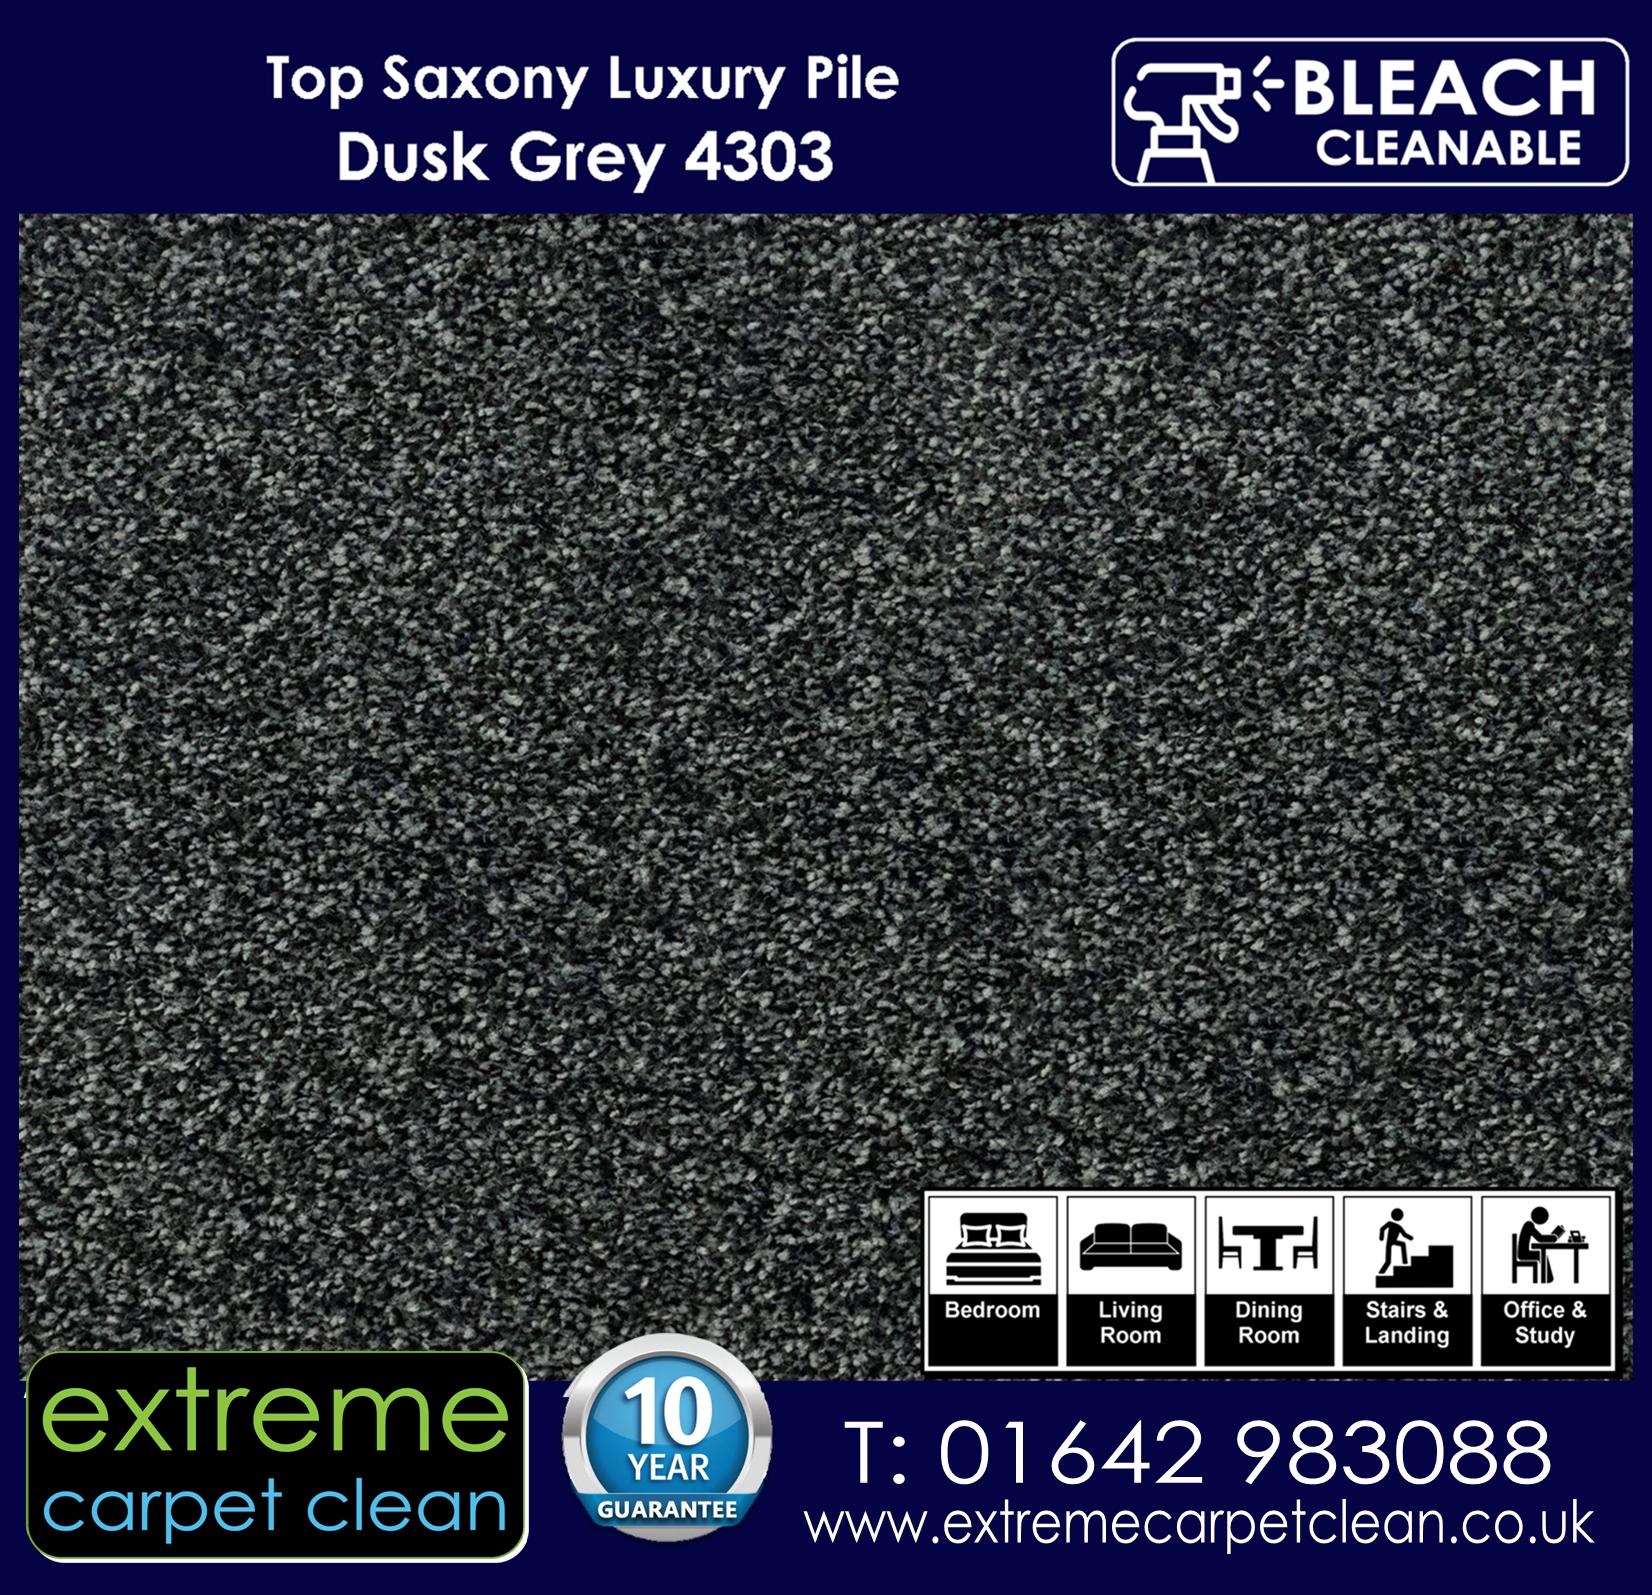 Extreme Carpet Clean Top Saxony Dusk Grey  Carpet 4302